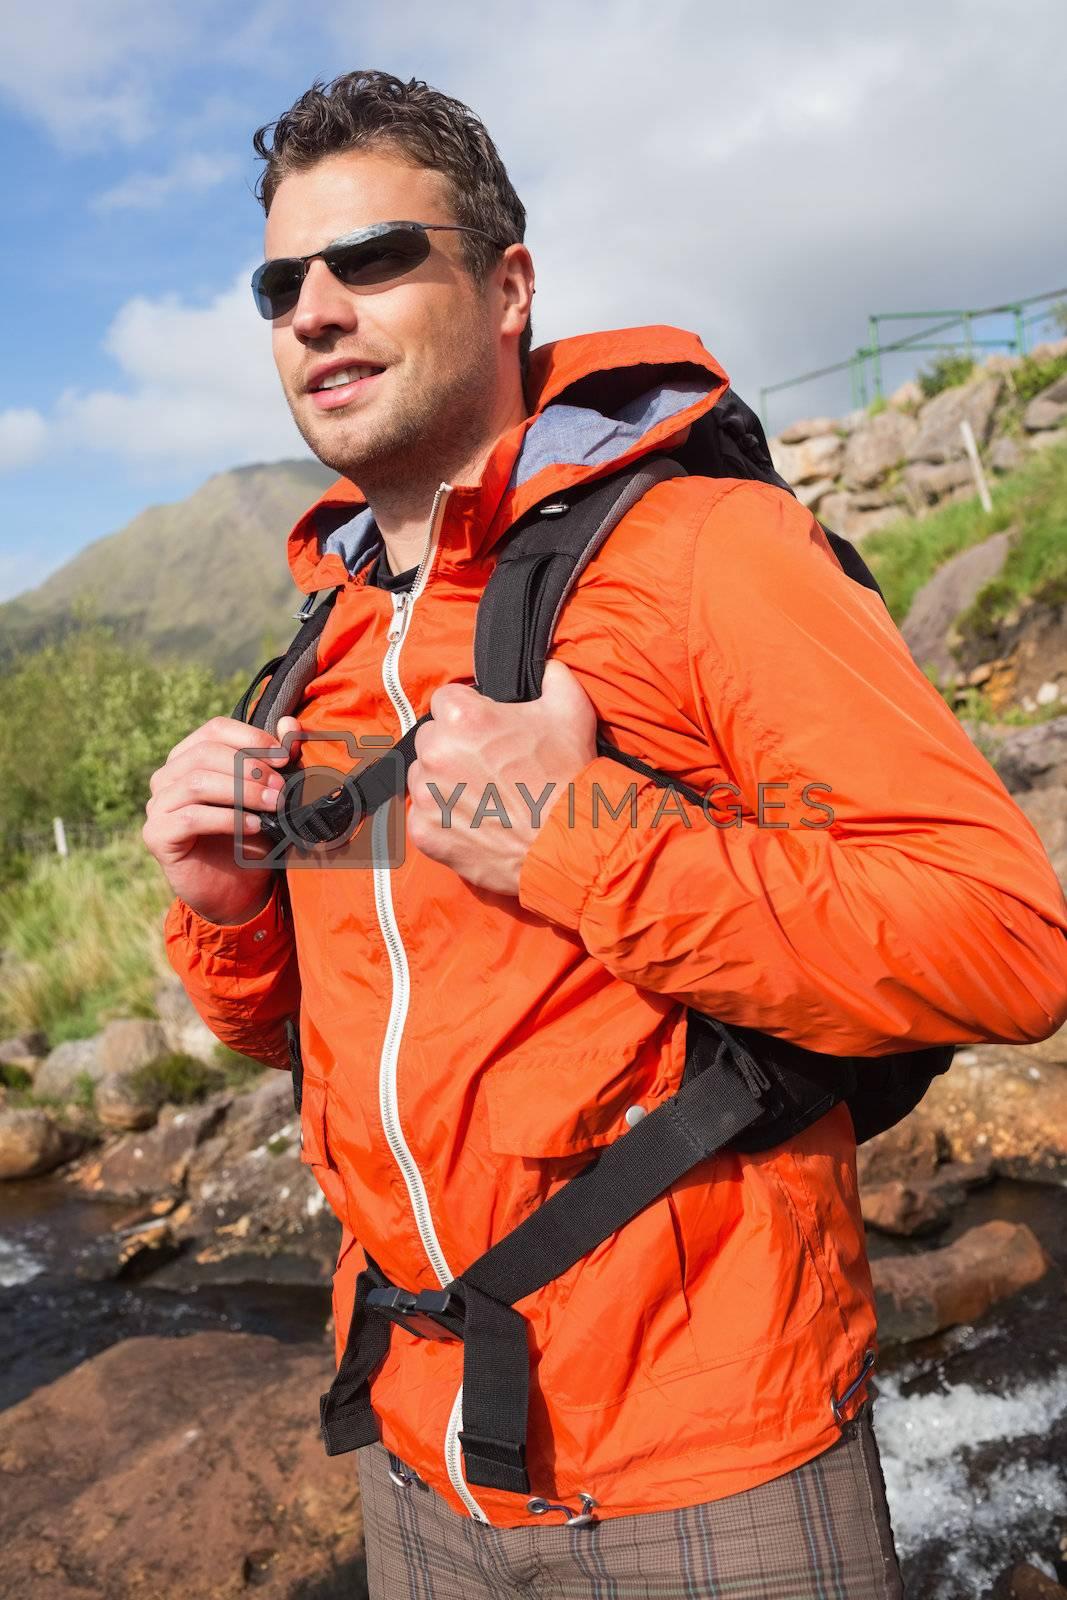 Man wearing rain jacket and sunglasses smiling by Wavebreakmedia